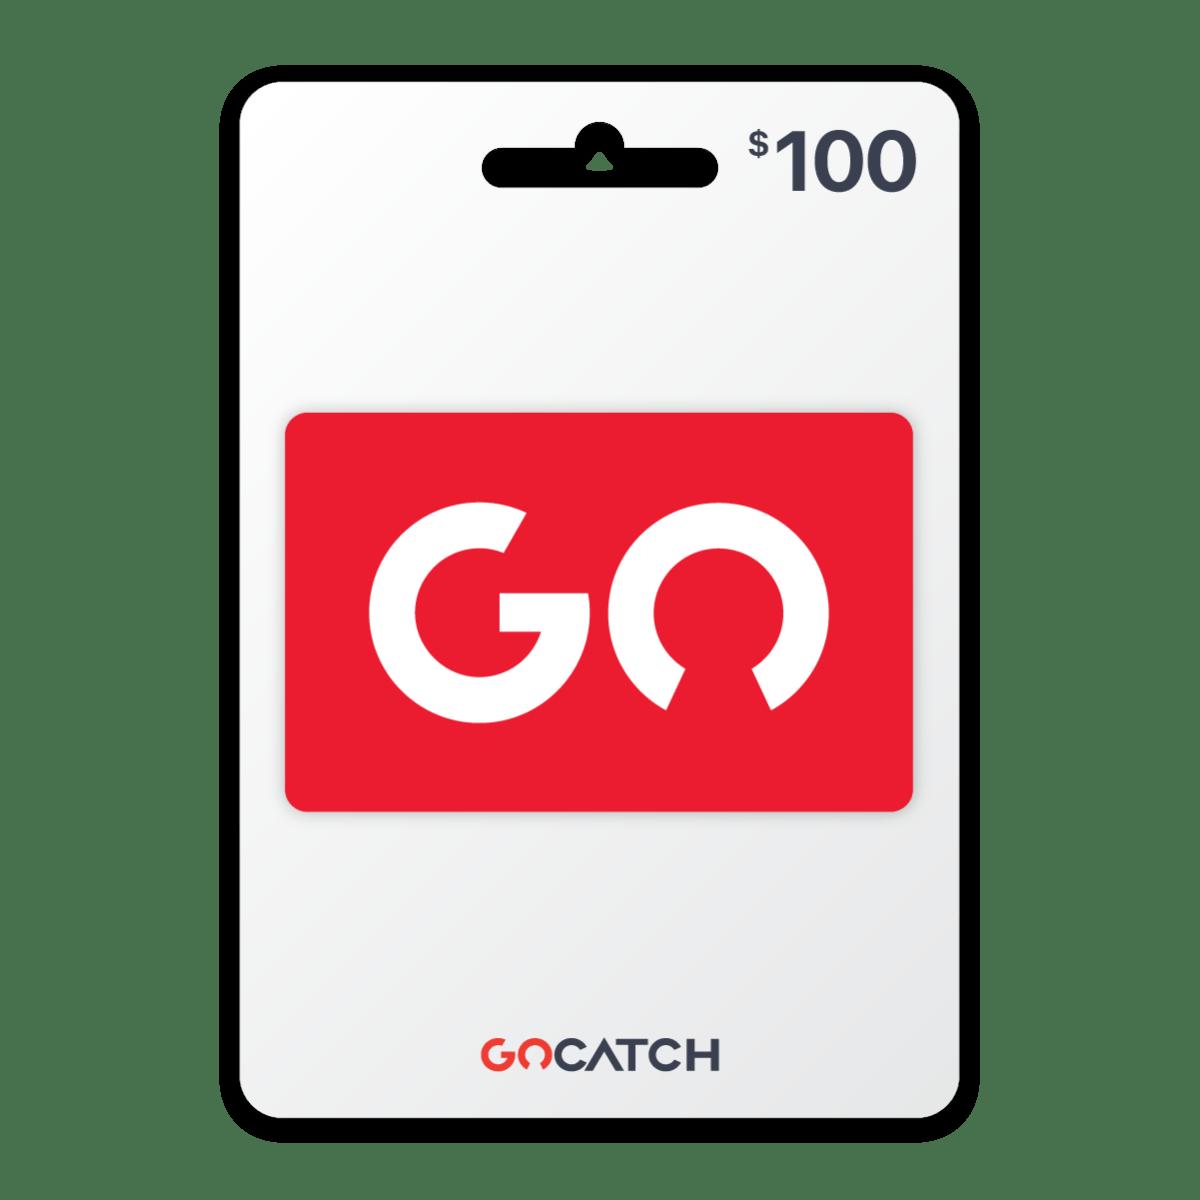 $100 Gift Card 4